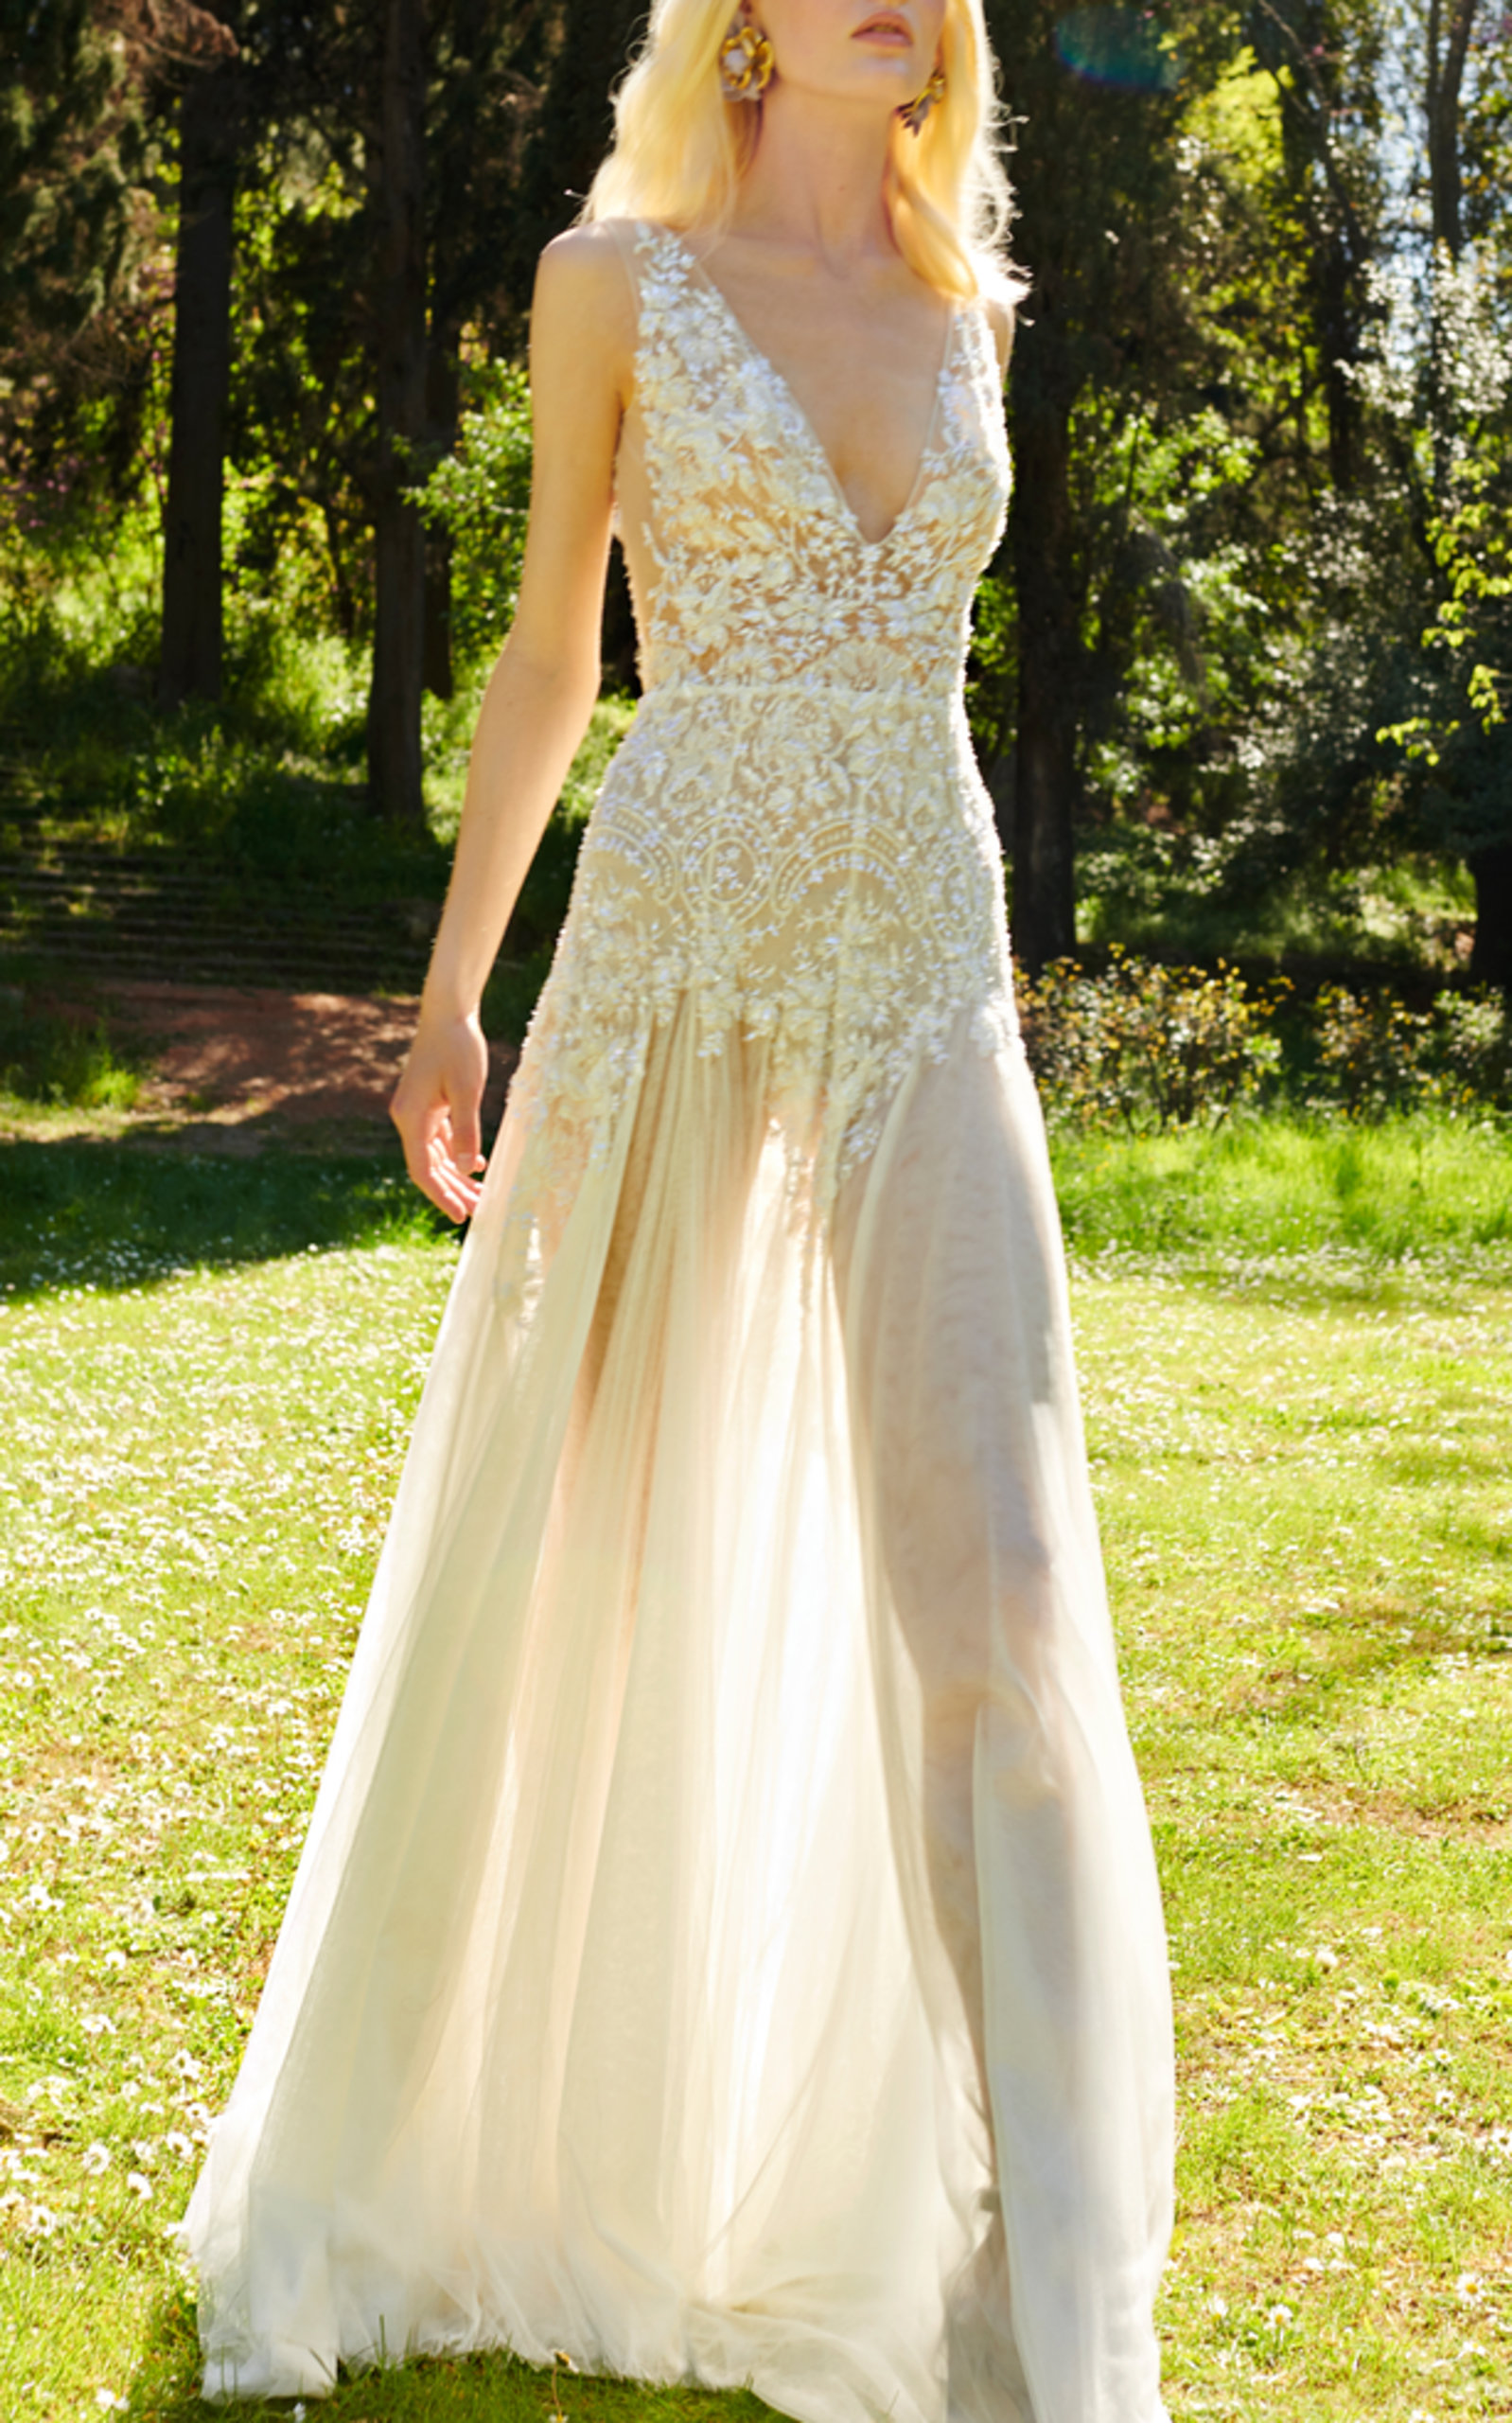 COSTARELLOS BRIDAL CHANTILLY LACE DRESS